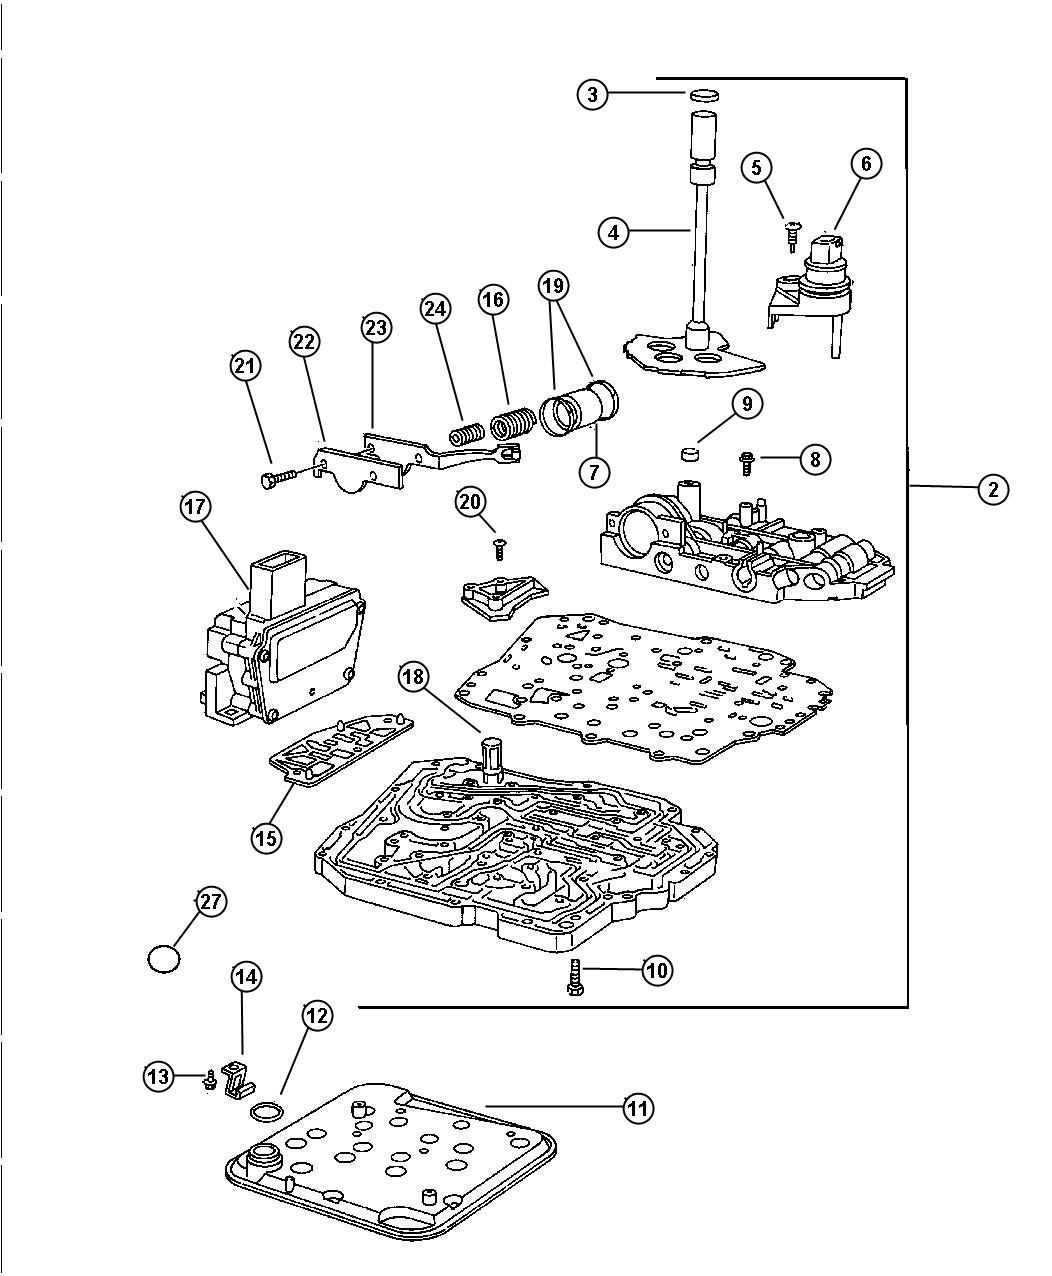 1997 dodge intrepid engine diagram electrolux wiring refrigerator parts trans imageresizertool com